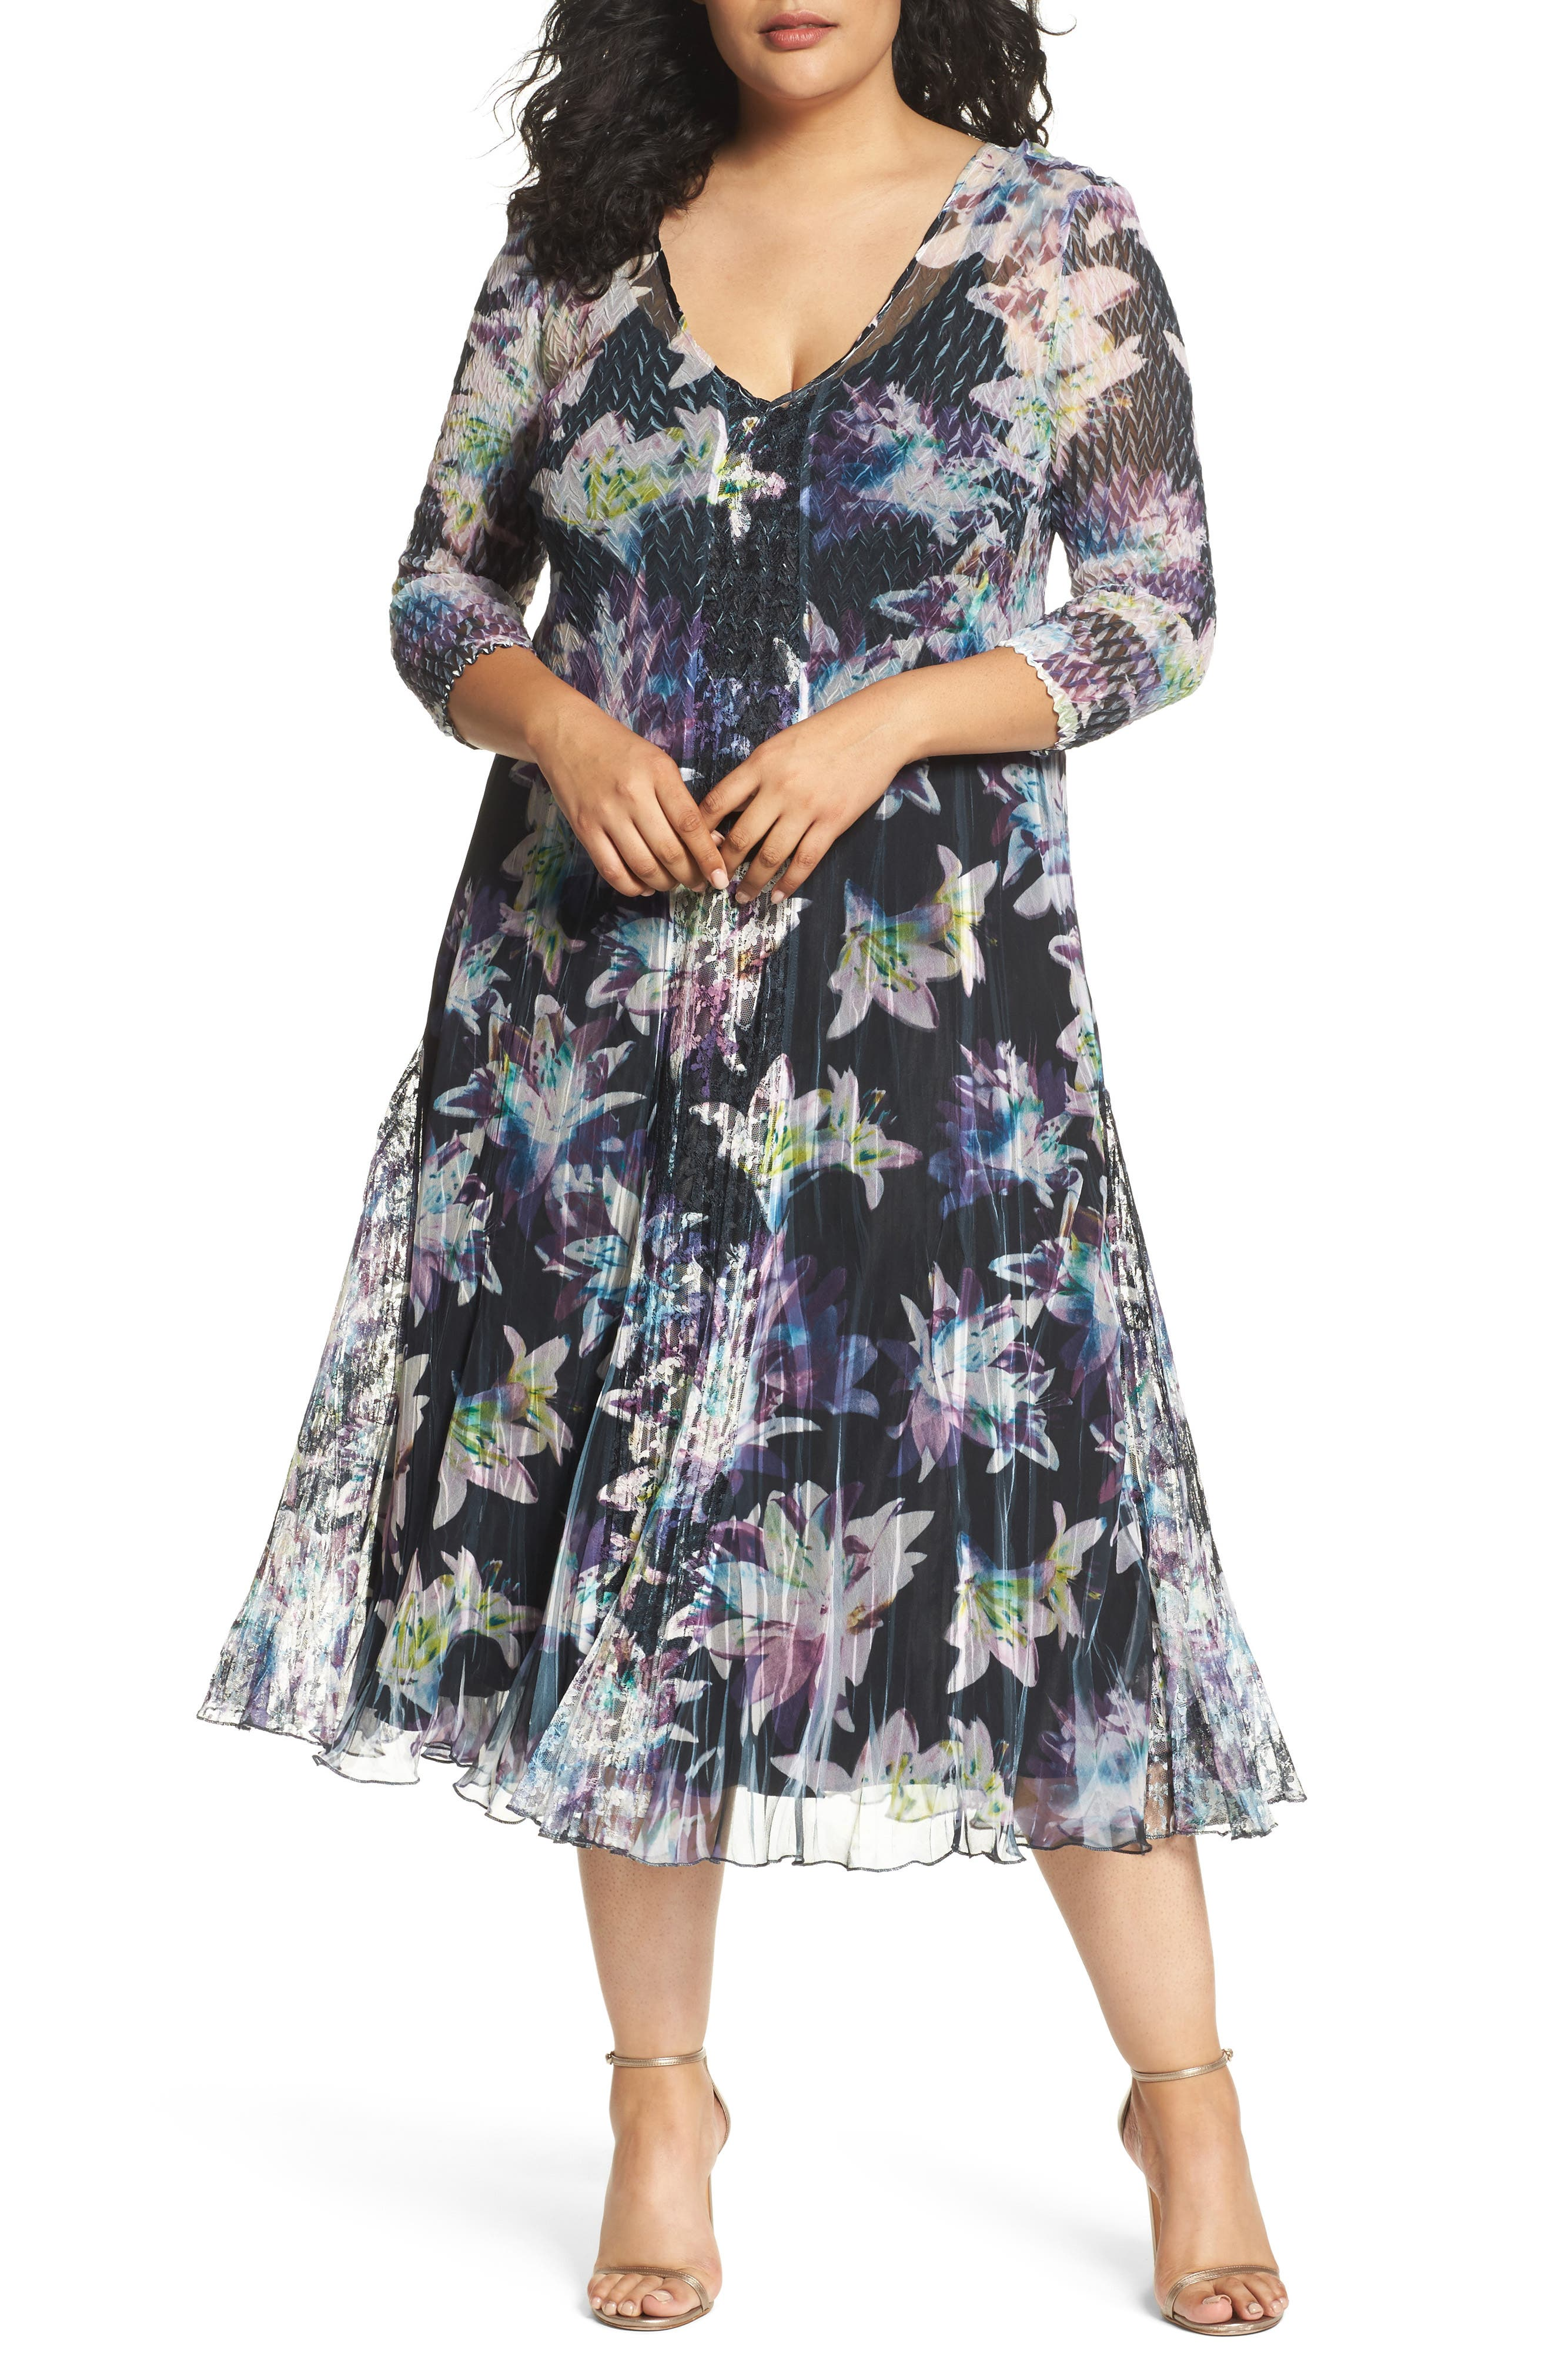 Alternate Image 1 Selected - Komarov Floral Charmeuse & Chiffon A-Line Dress (Plus Size)